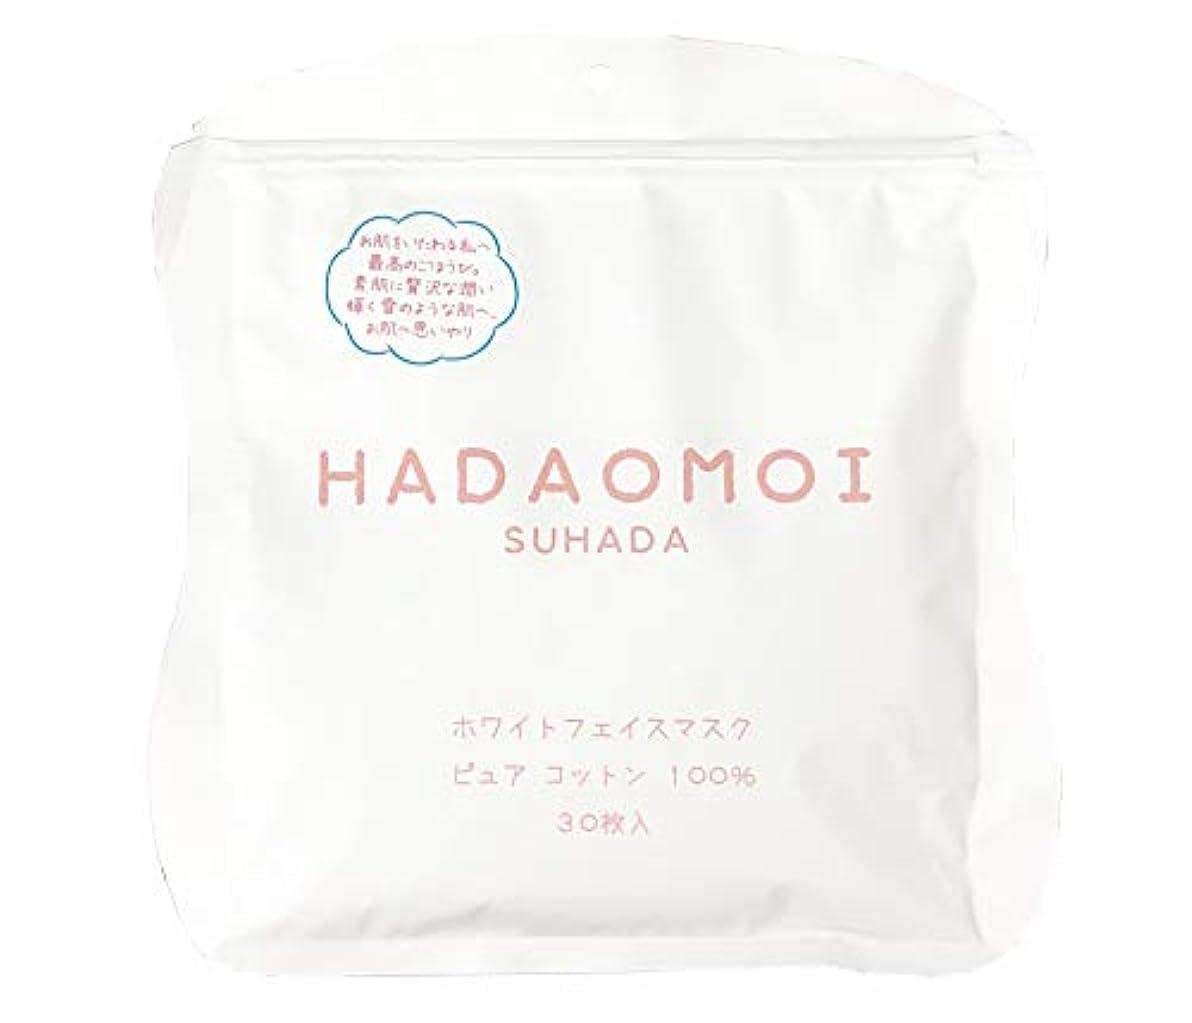 HADAOMOI(ハダオモイ) ホワイトフェイスマスク 30枚入